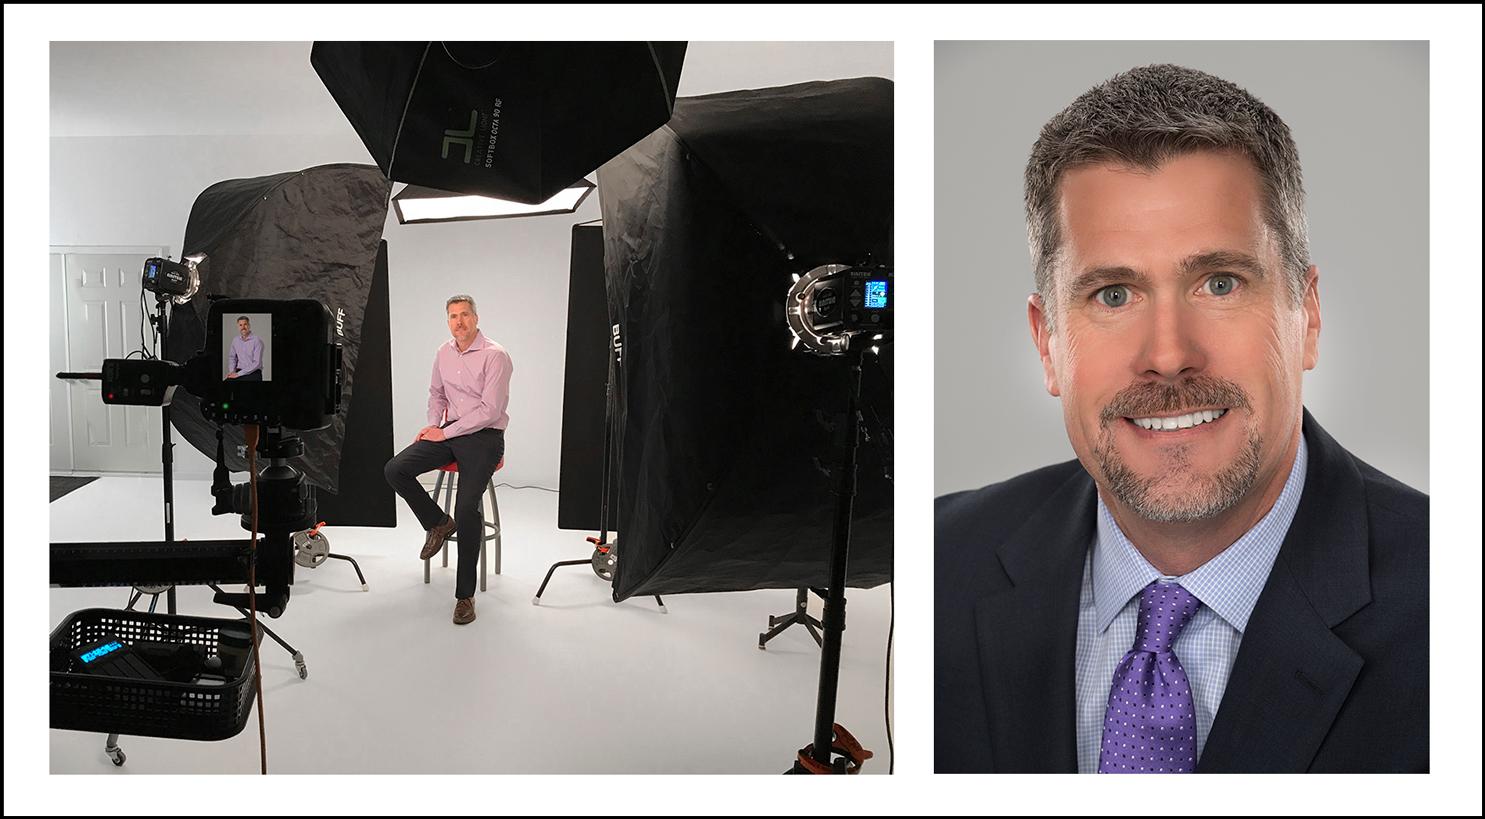 business headshots in a photo studio